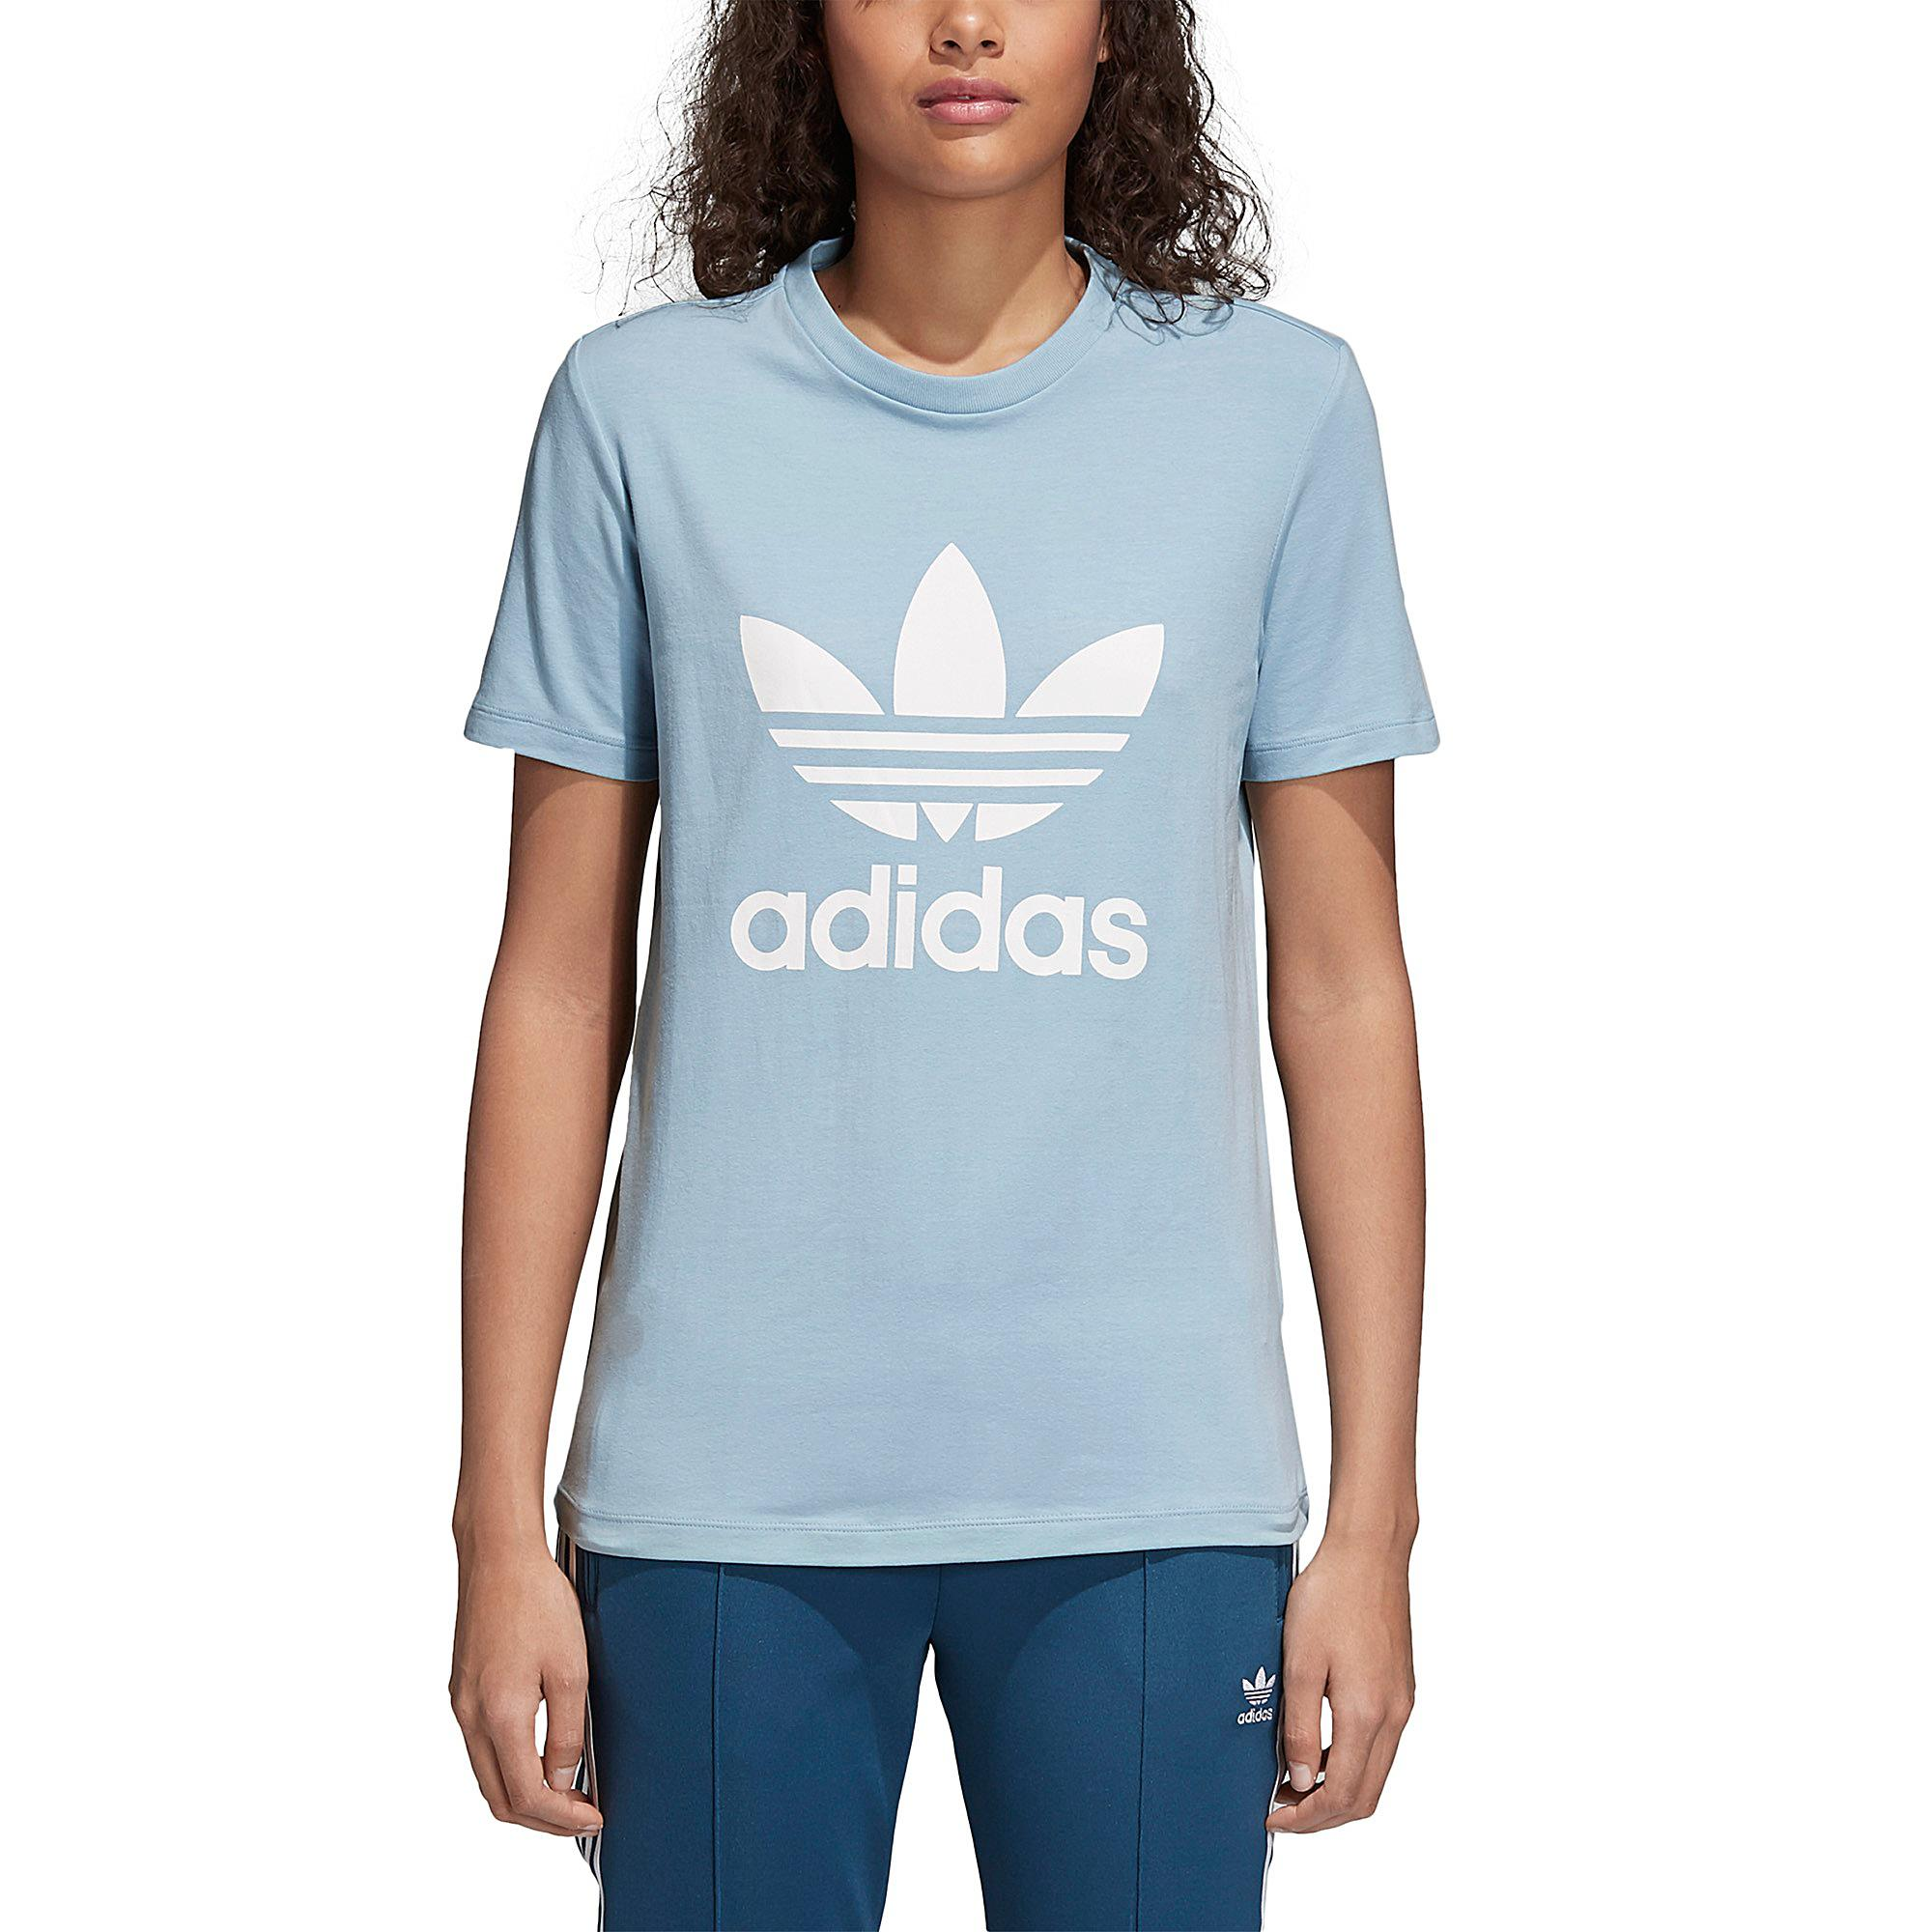 64b1fde9ad7 Lyst - adidas Originals Adicolor Trefoil T-shirt in Blue